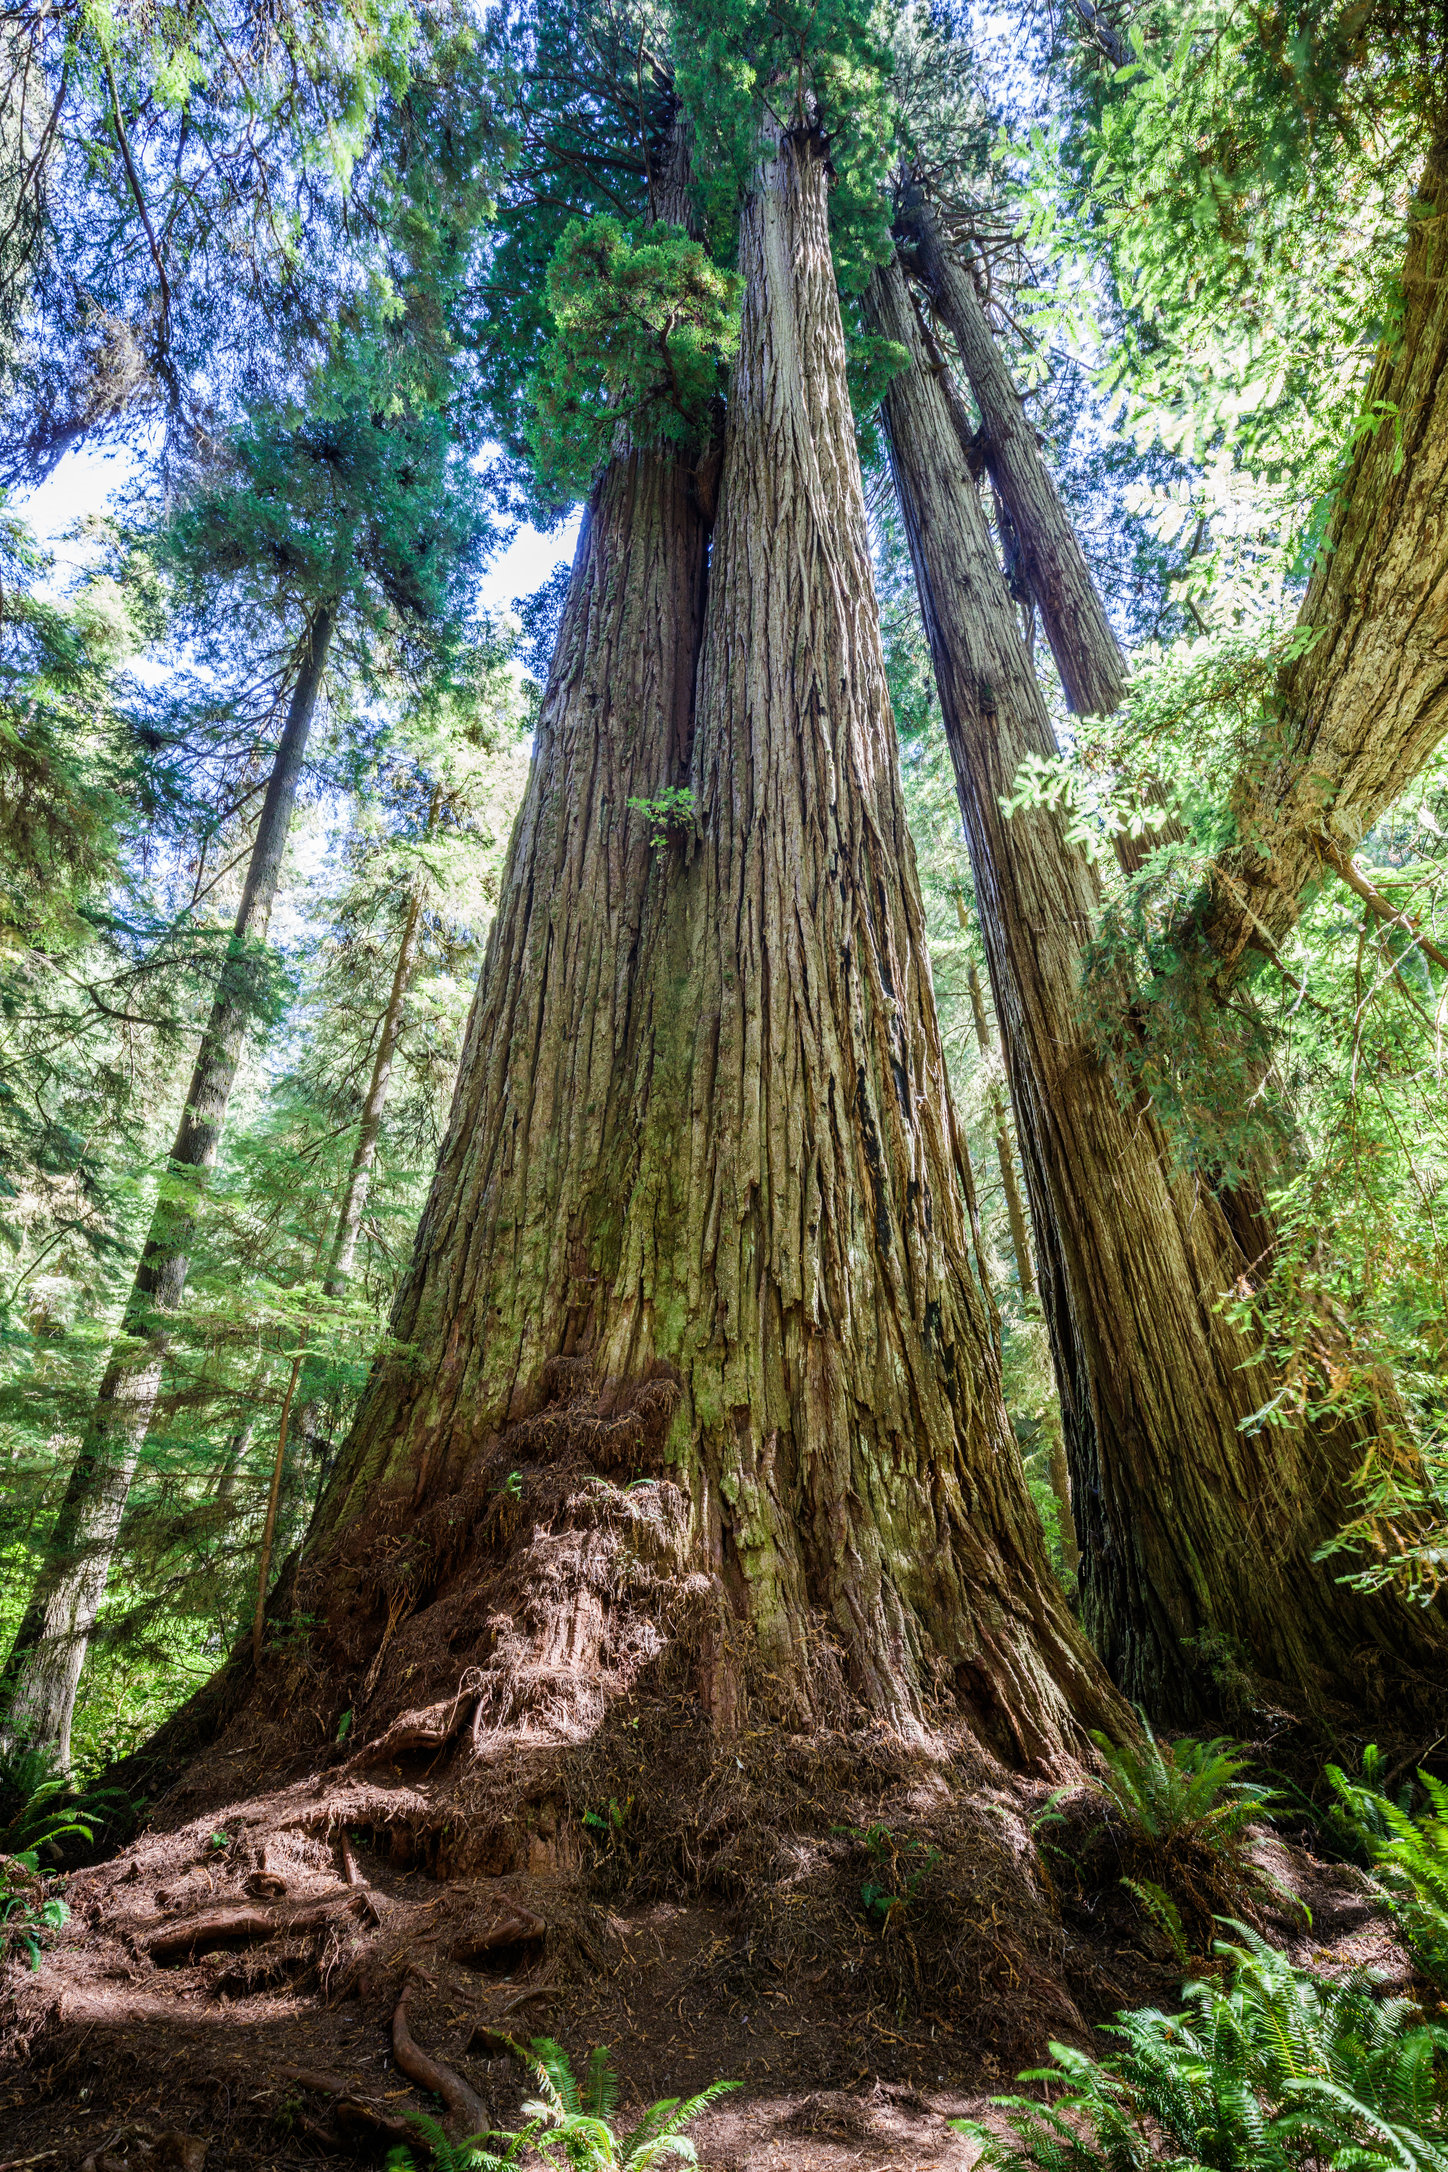 Massive redwood in the Grove of Titans